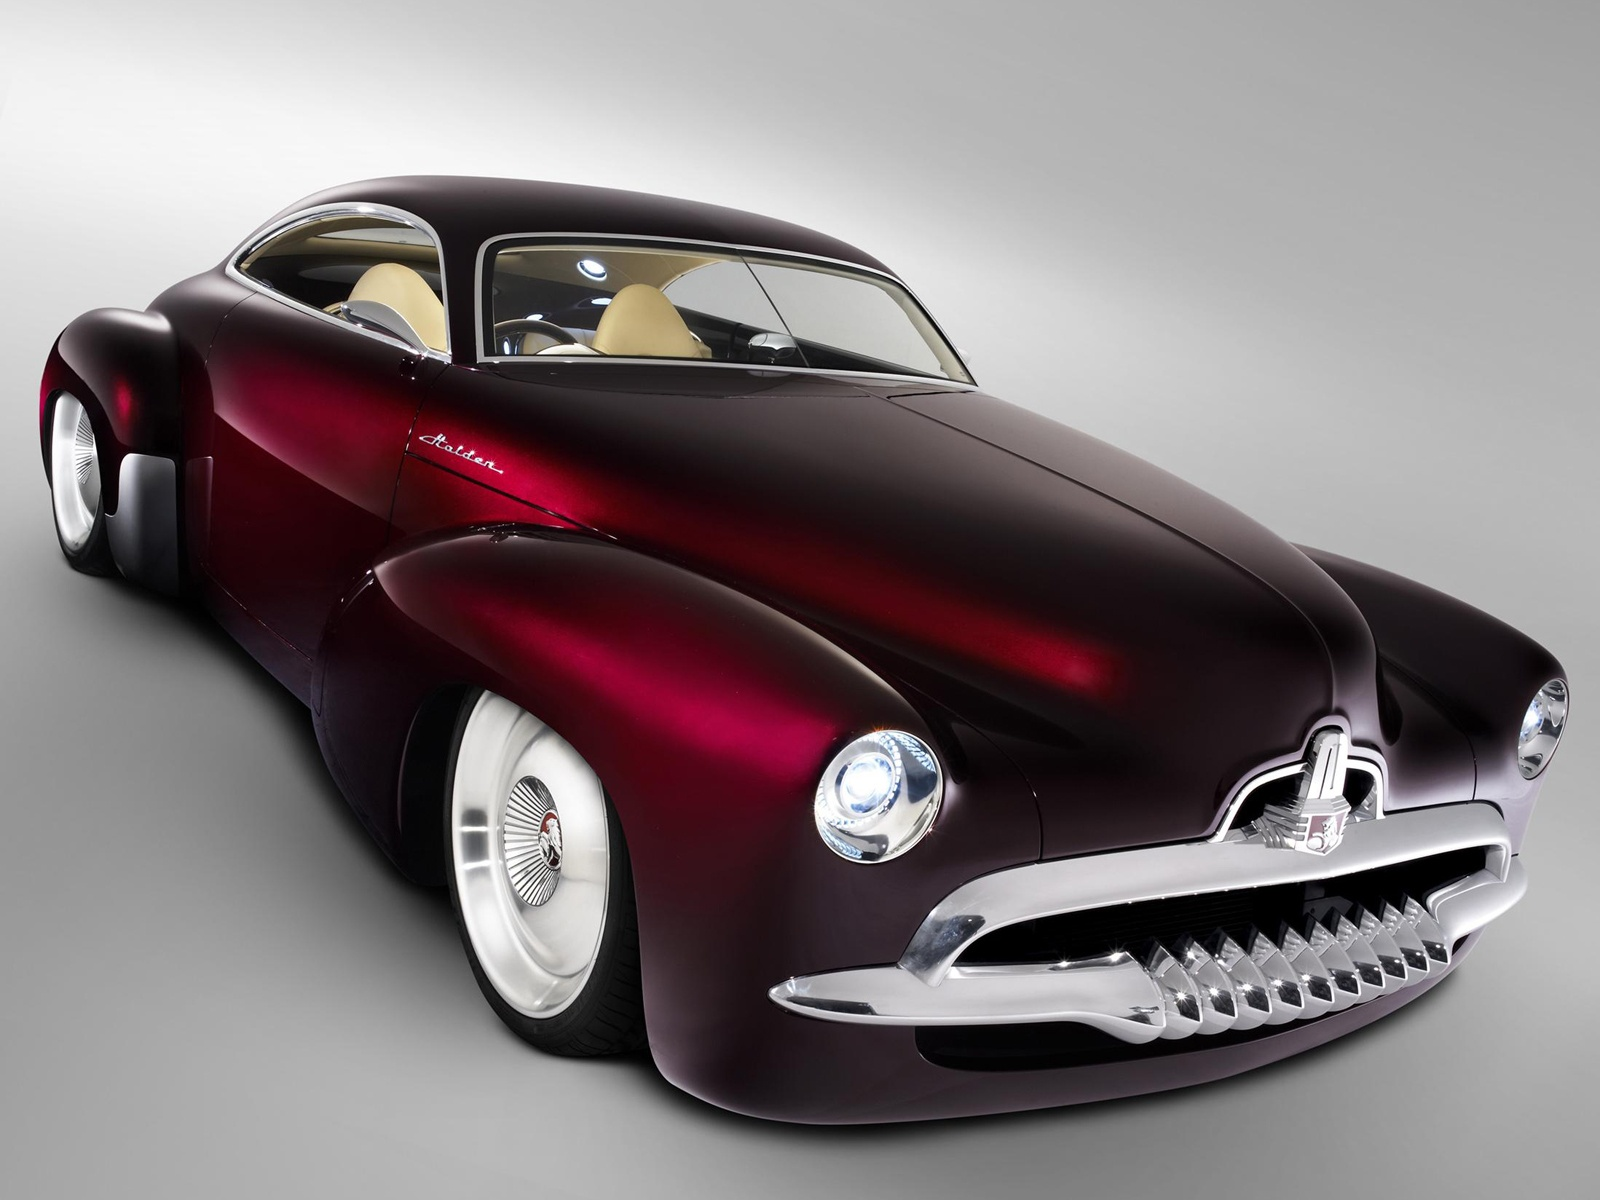 Download wallpapersfree wallpaper pimped cars voltagebd Gallery